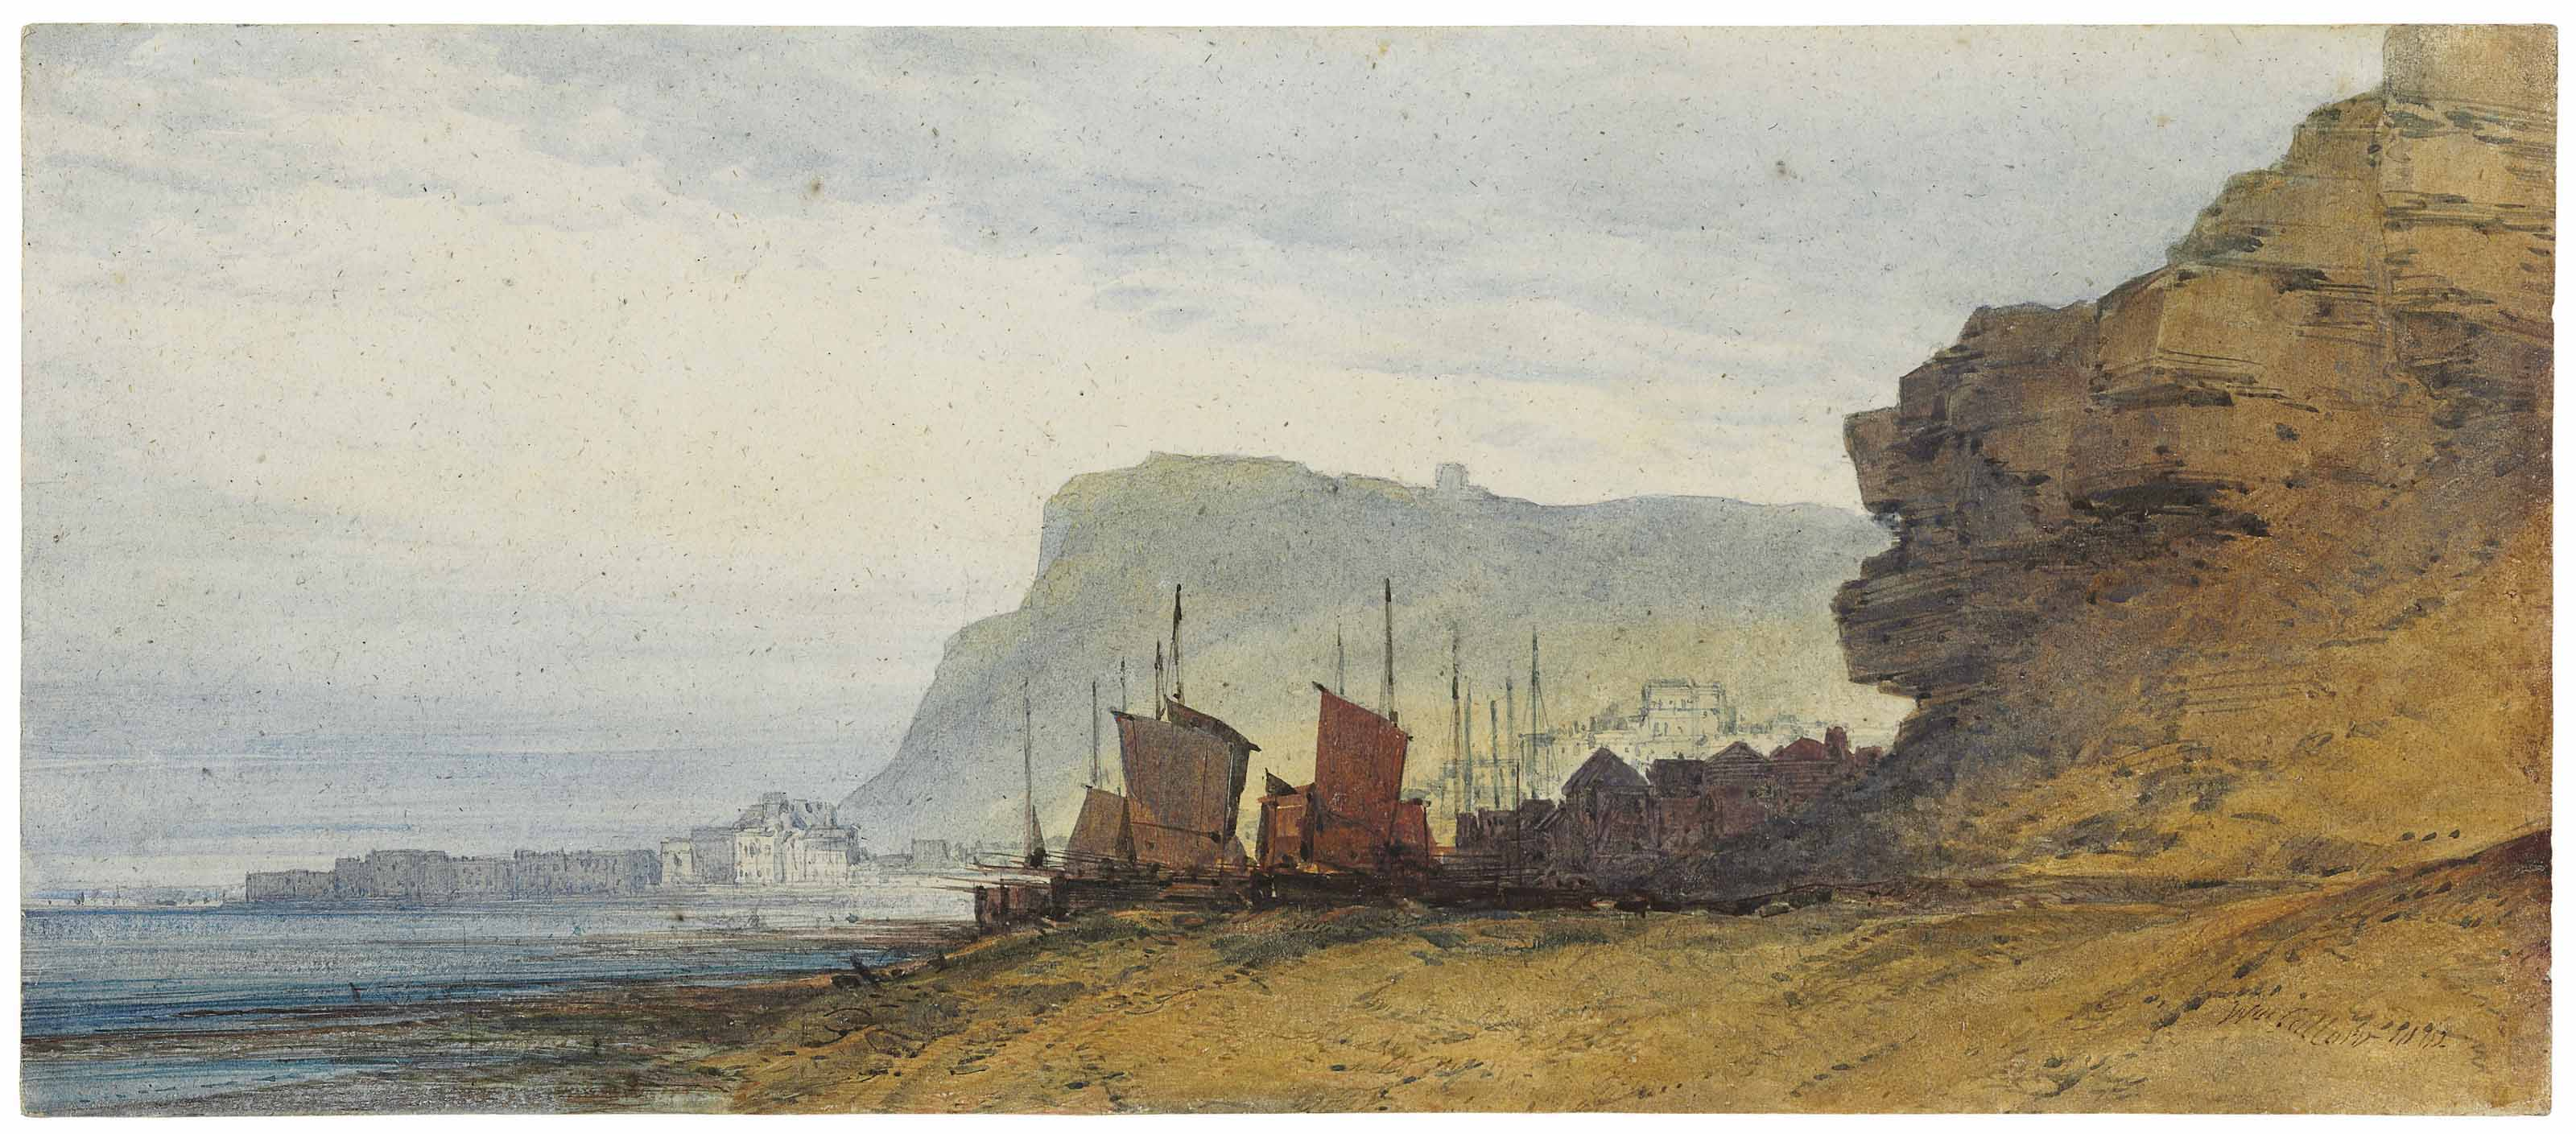 William Callow, R.W.S. (Greenw